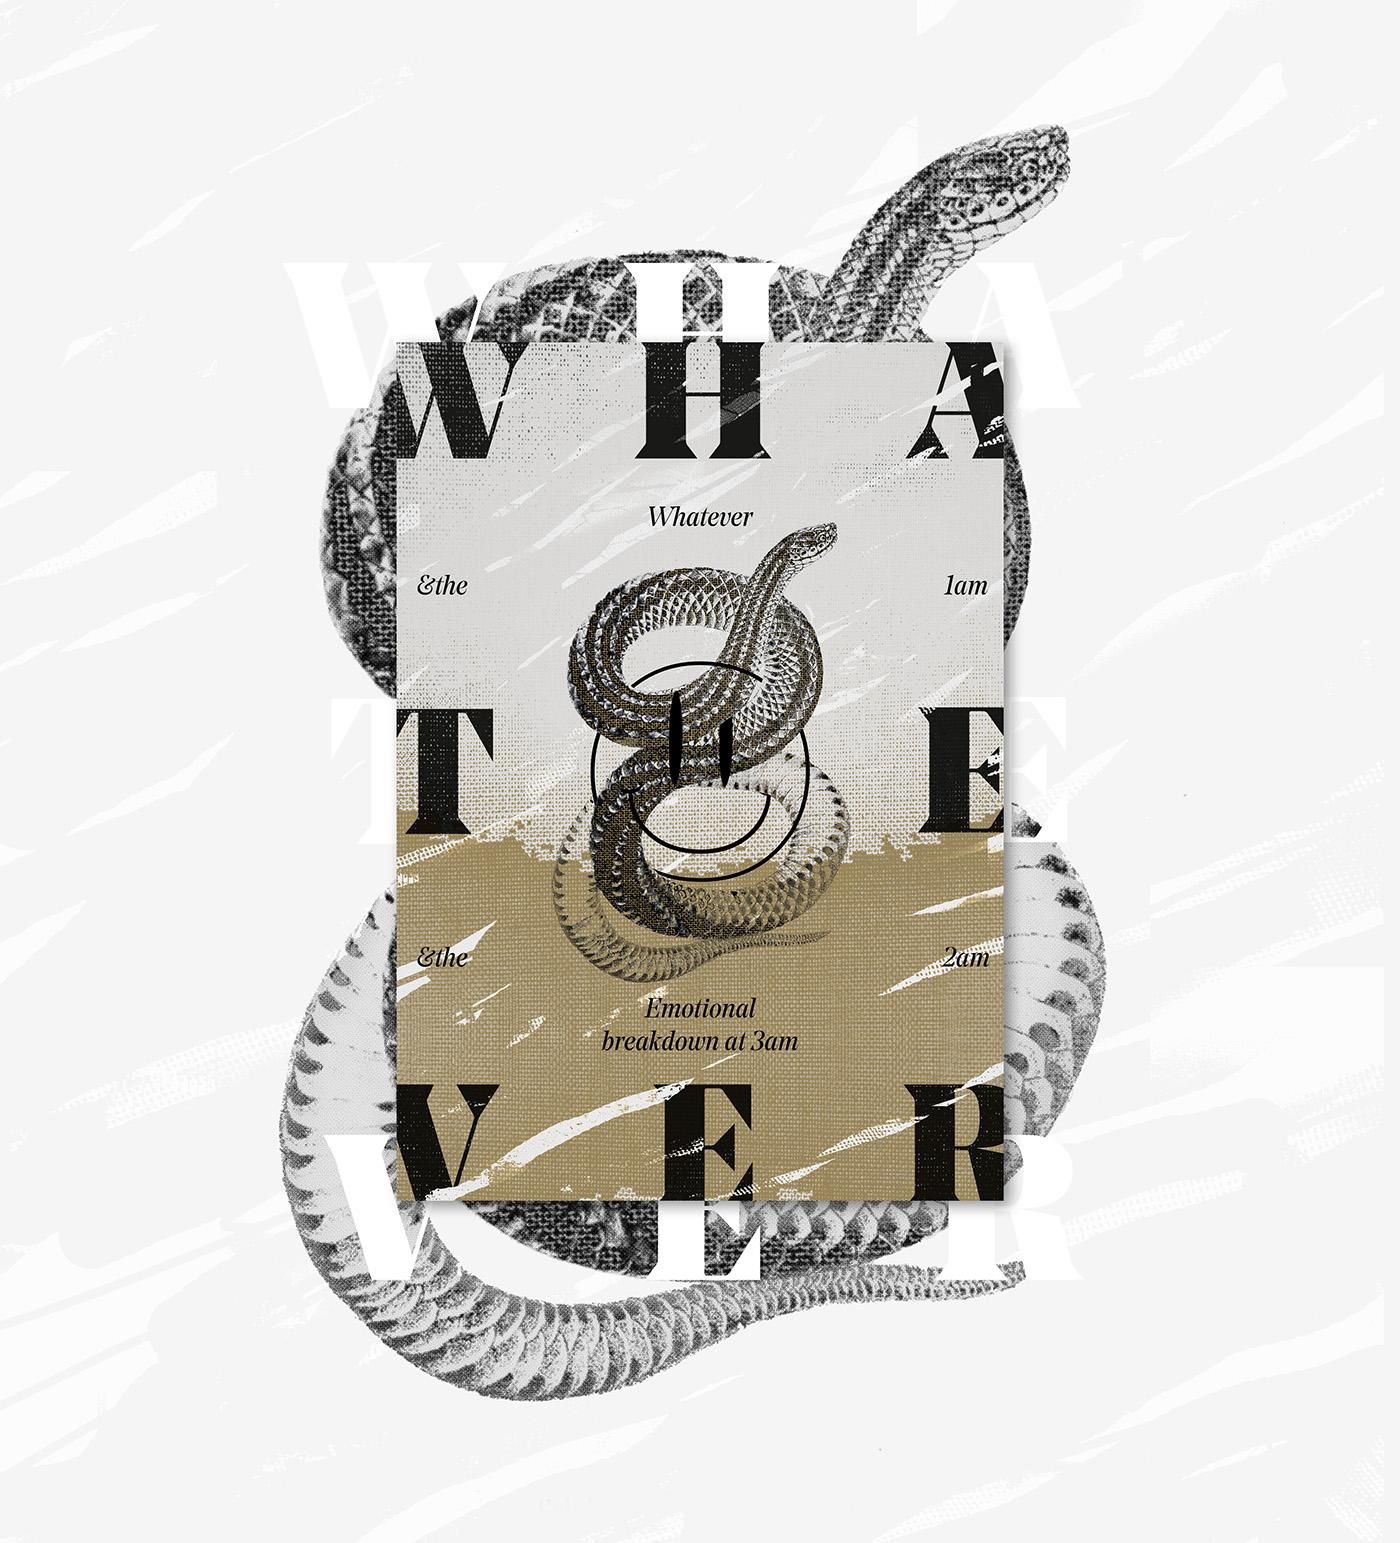 poster graphic design  instagram type Collection Layout series uba random aesthetic